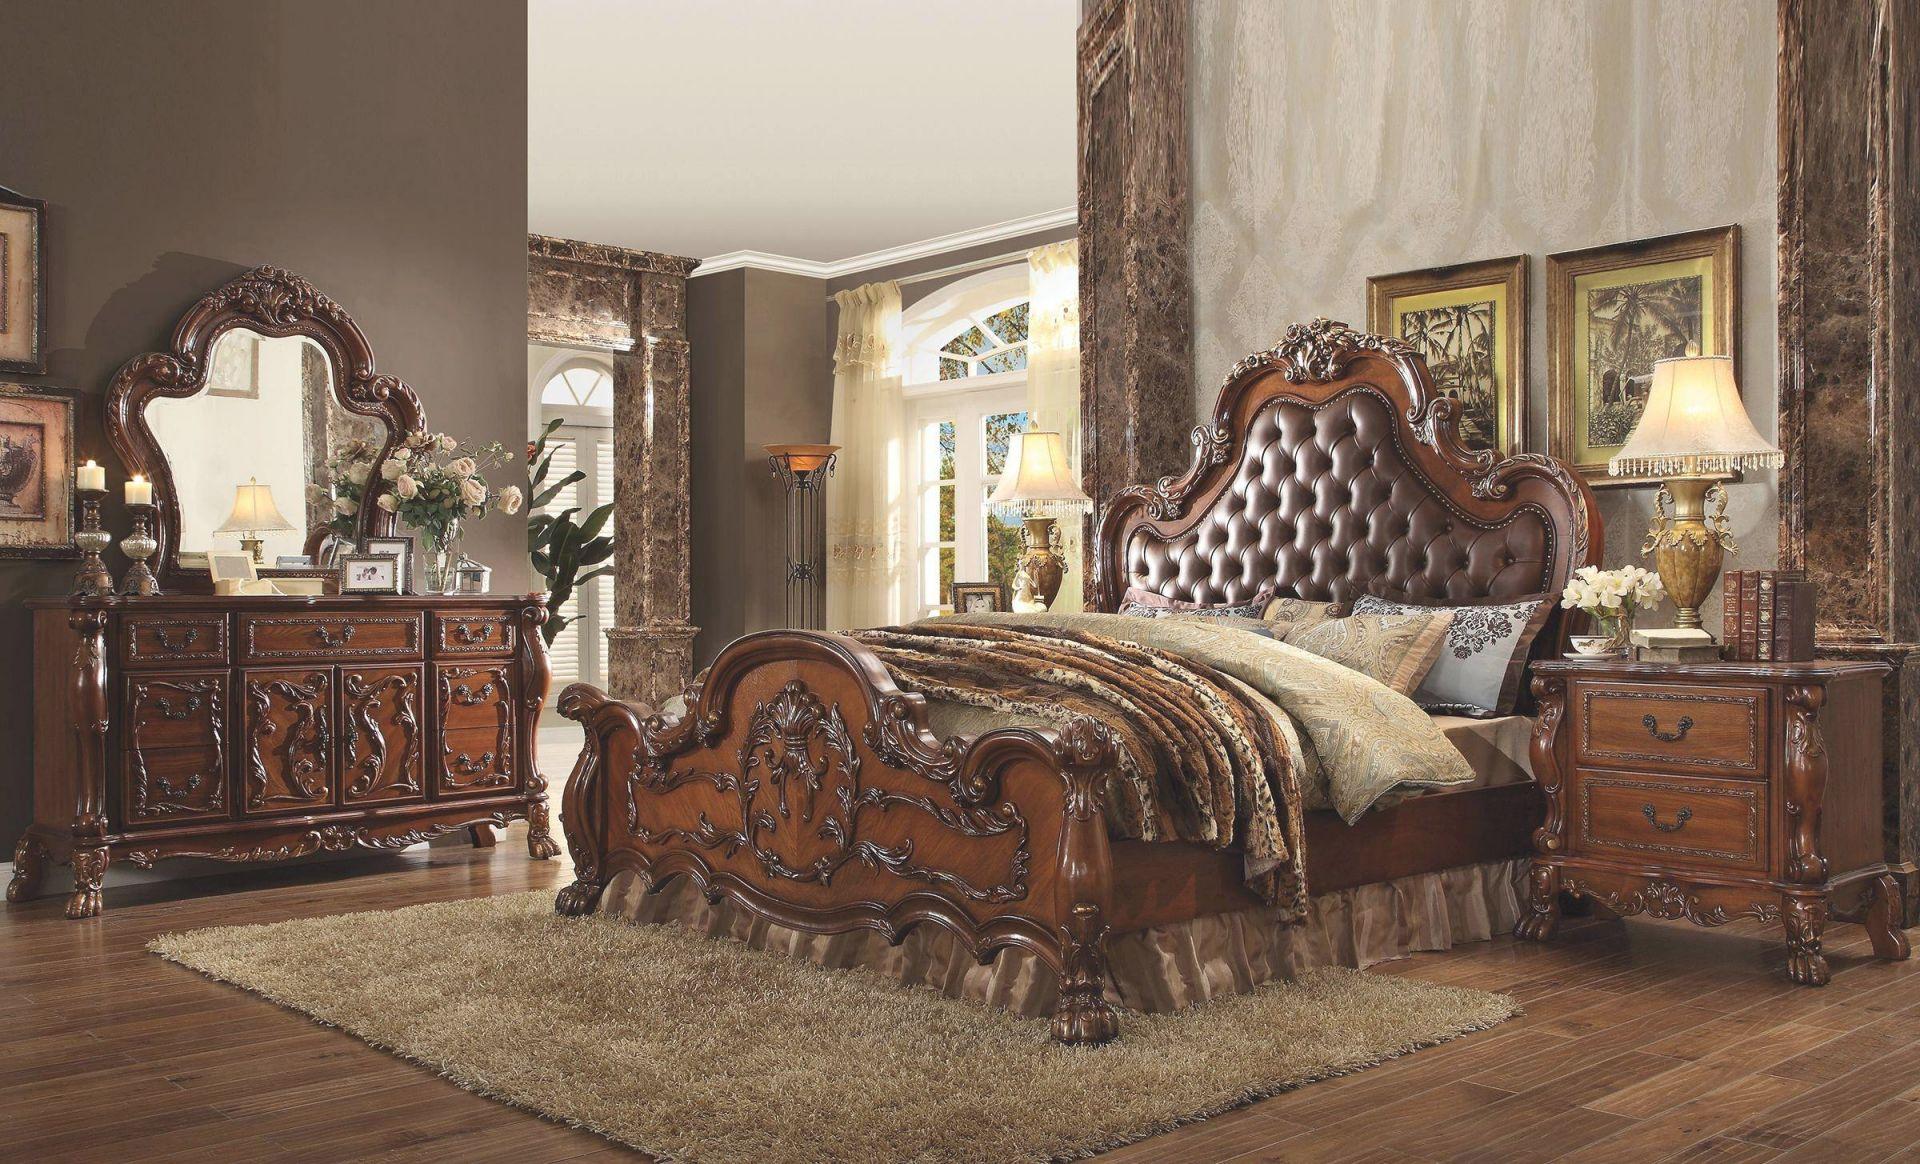 Tufted Cherry Oak King Bedroom Set 4Pcs Dresden 23137Ek Acme within Luxury Oak Bedroom Furniture Sets